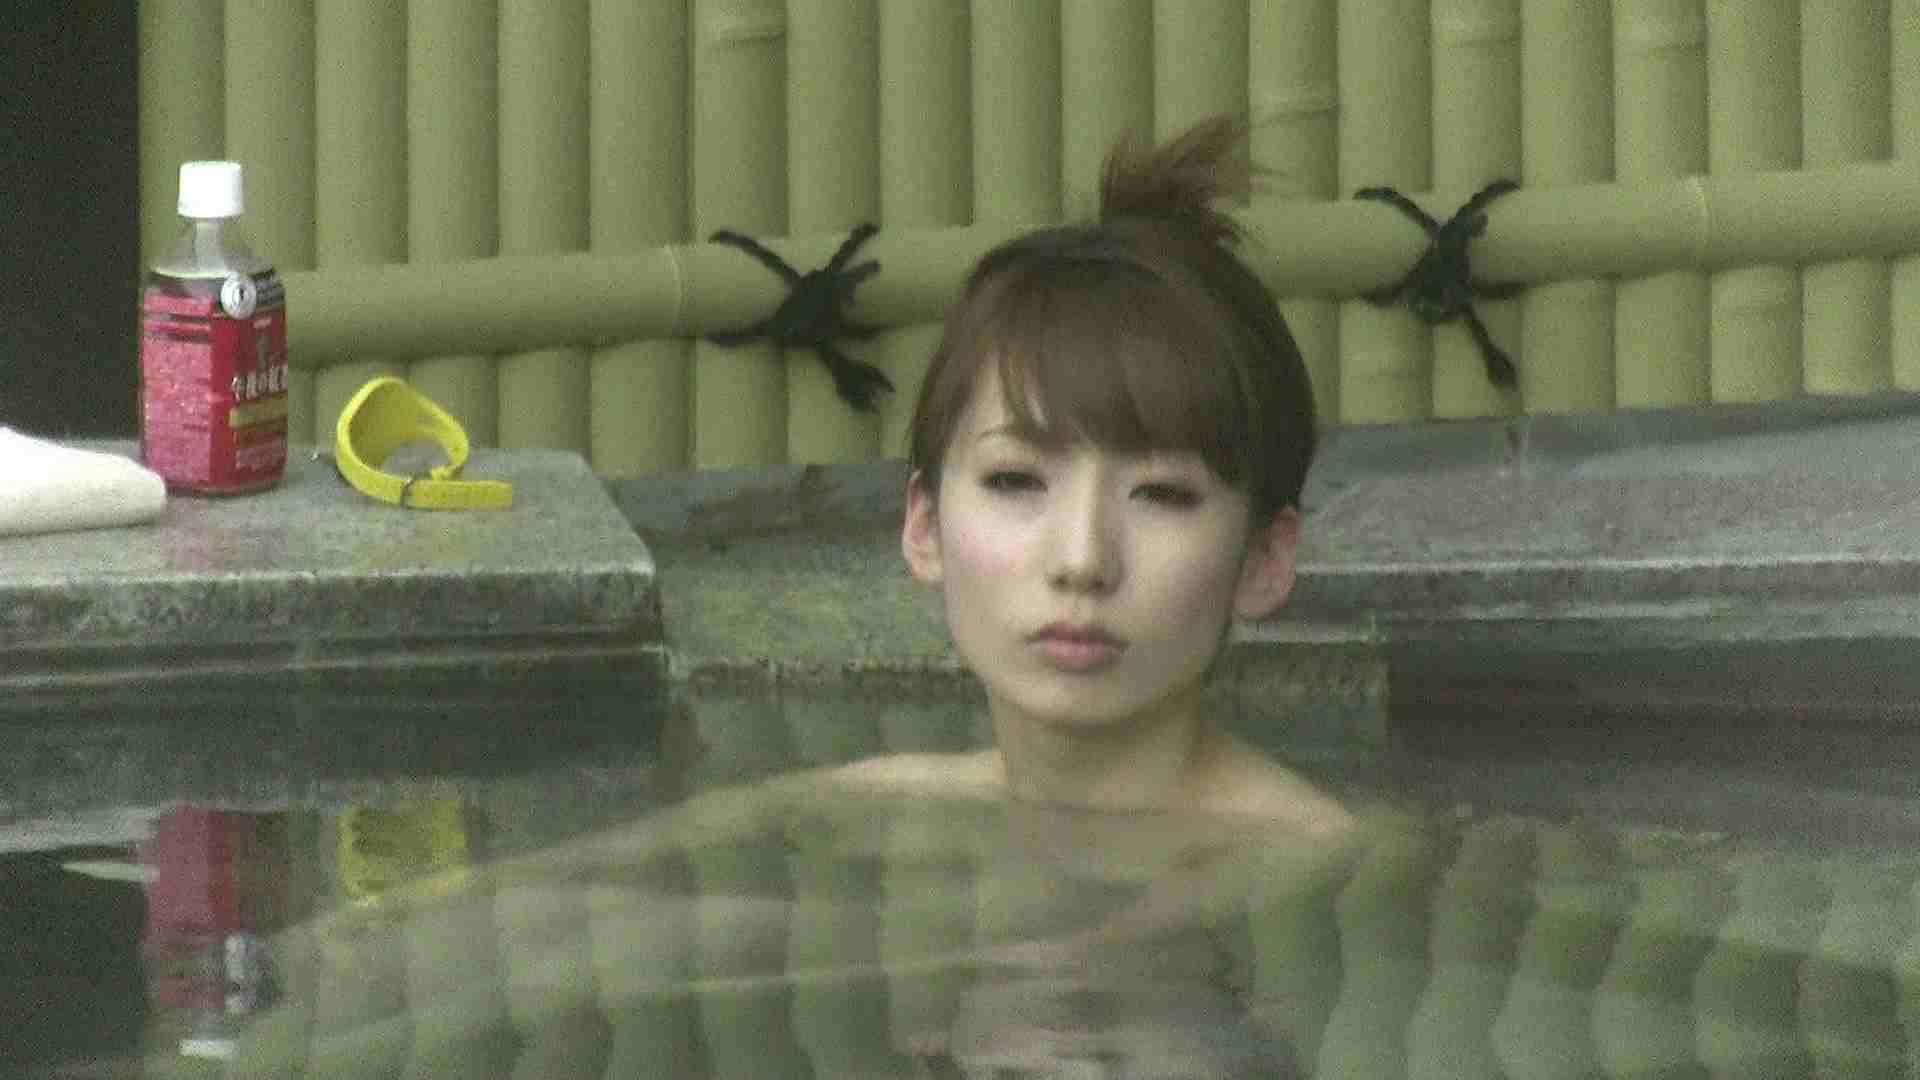 Aquaな露天風呂Vol.208 露天風呂編  103PIX 38